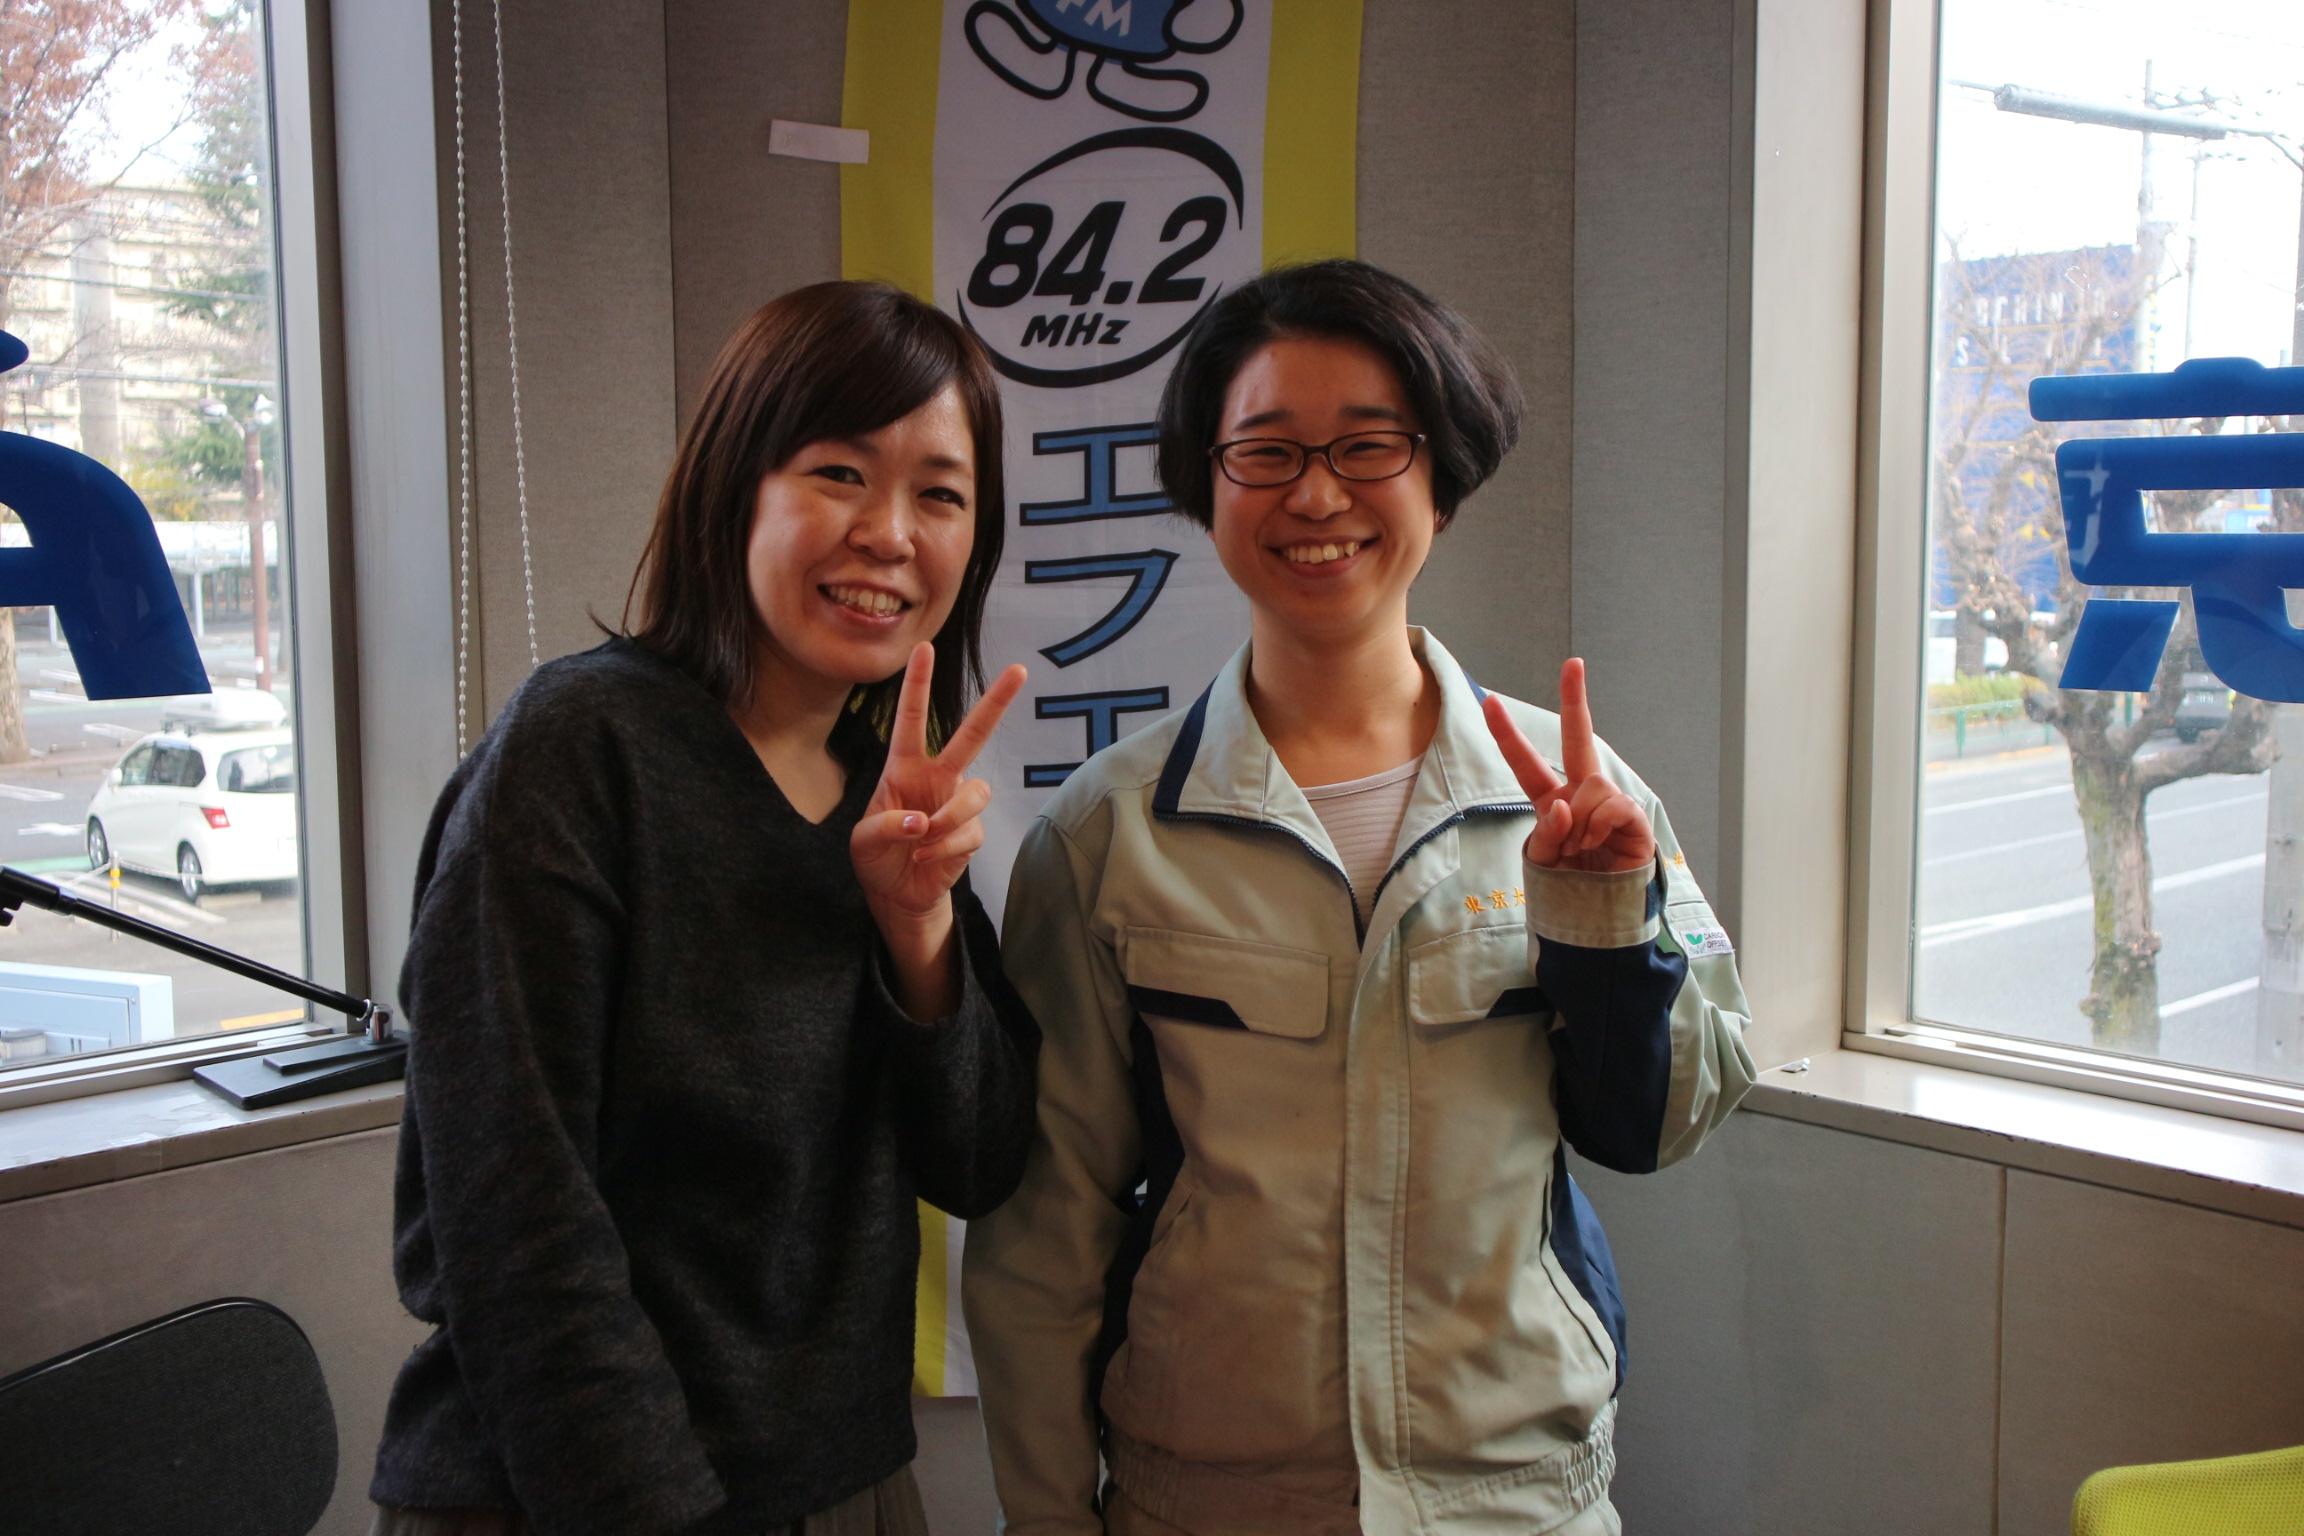 syokunoumo4 (1).JPG